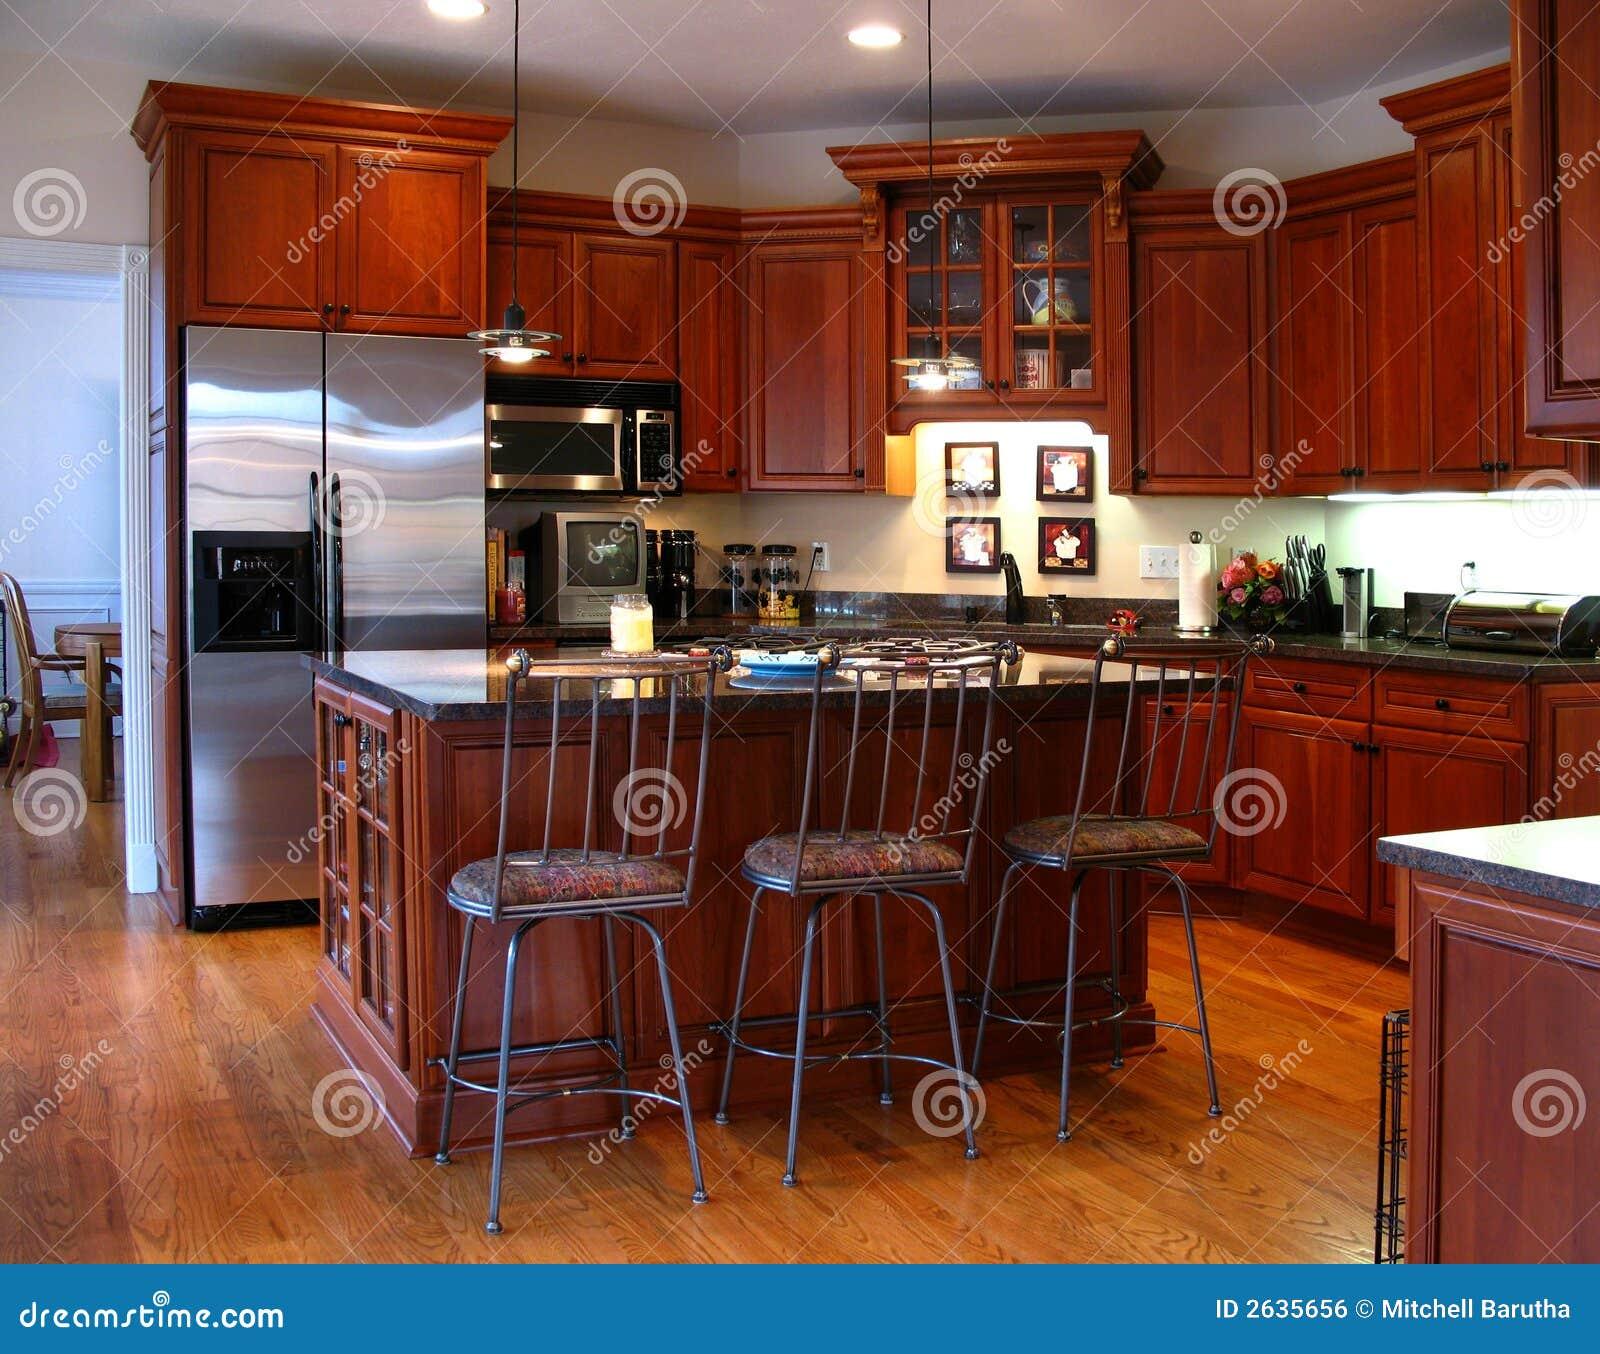 Upscale Kitchen Cabinets: Upscale Kitchen Horizontal Royalty Free Stock Image